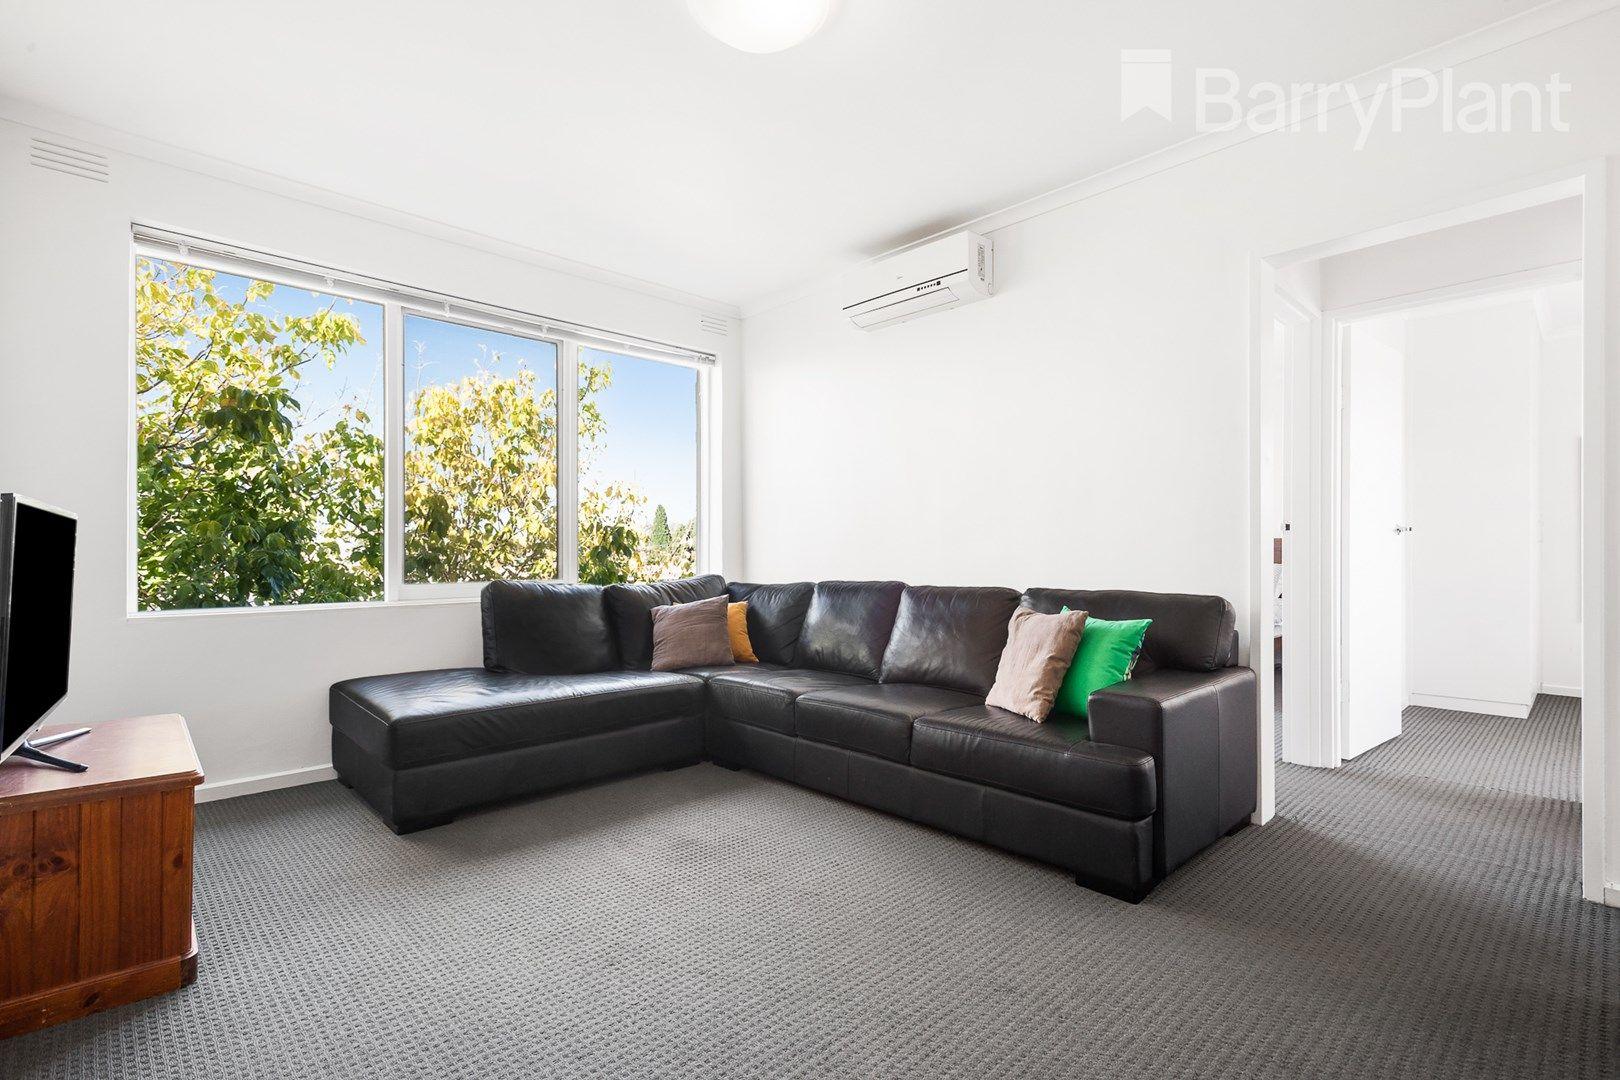 18/23 Baxter Street, Coburg VIC 3058, Image 0